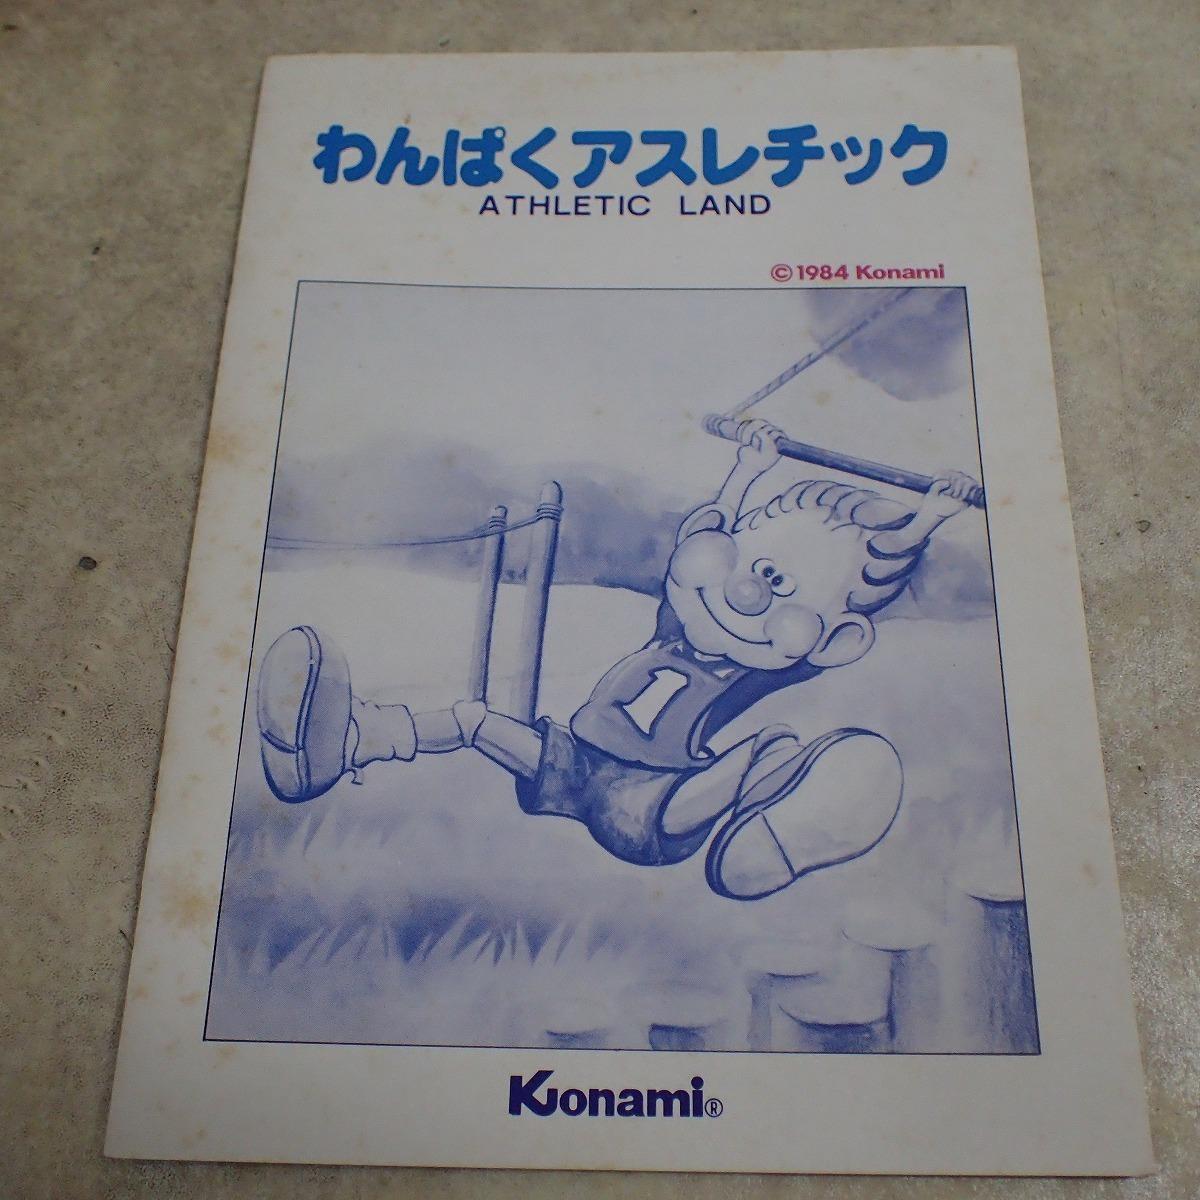 MSX ROM わんぱくアスレチック/ロードファイター/スカイジャガー/コナミ・ハイパーラリー/モピレンジャー等KONAMIソフト10本セット【20_画像2